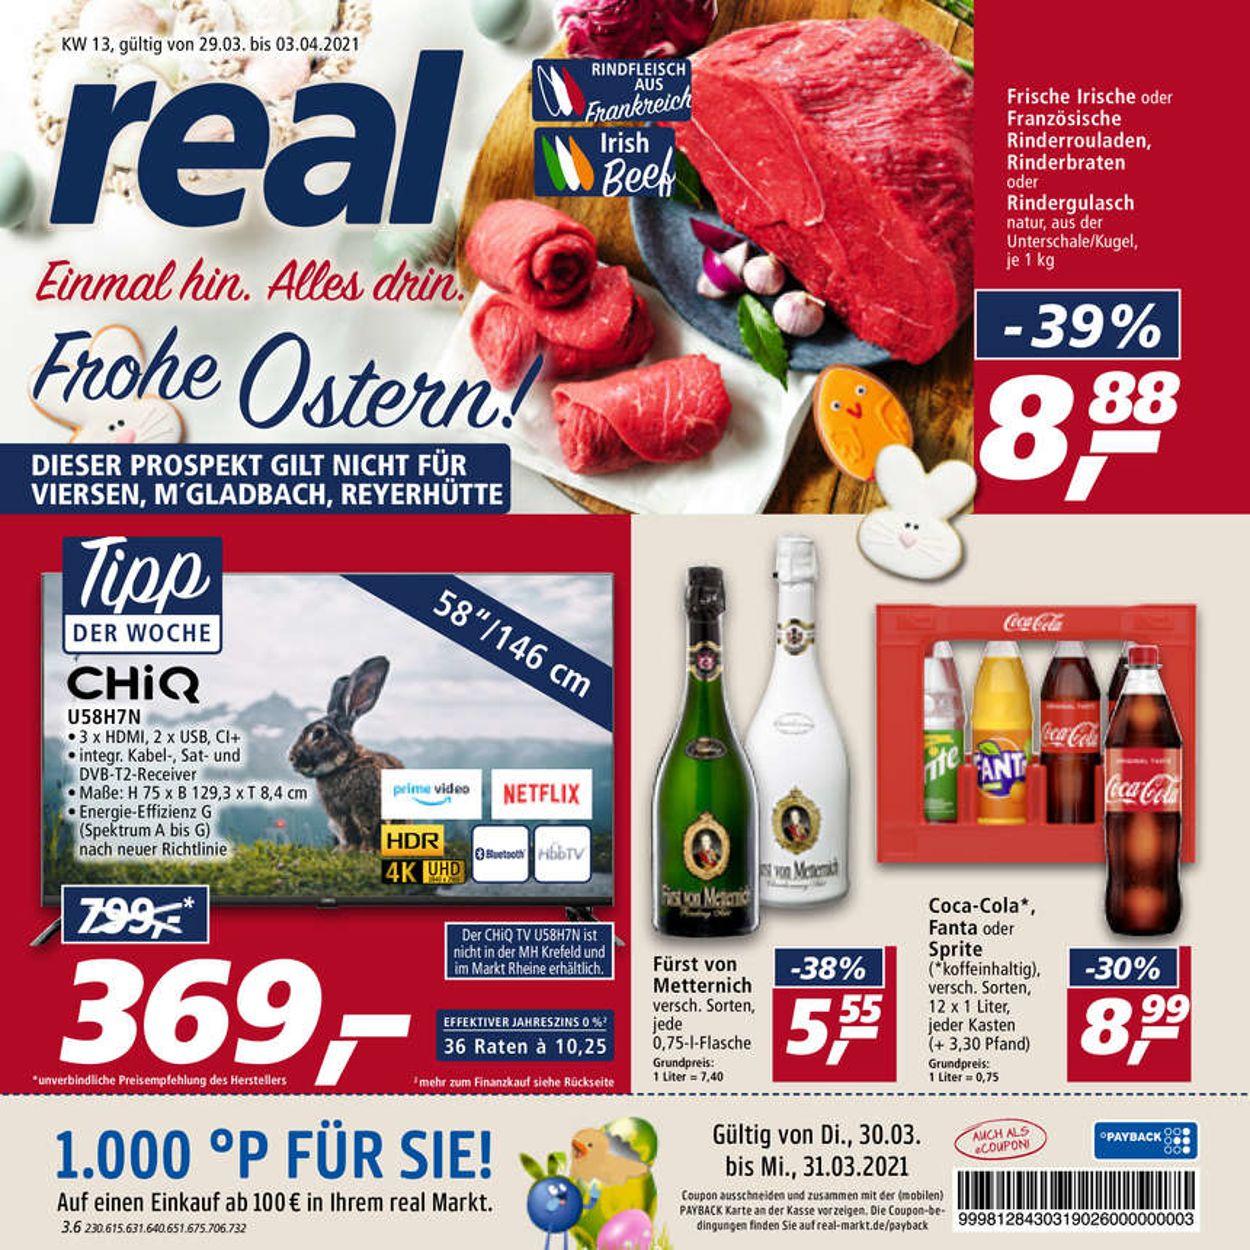 Real Ostern 2021 Prospekt - Aktuell vom 29.03-03.04.2021